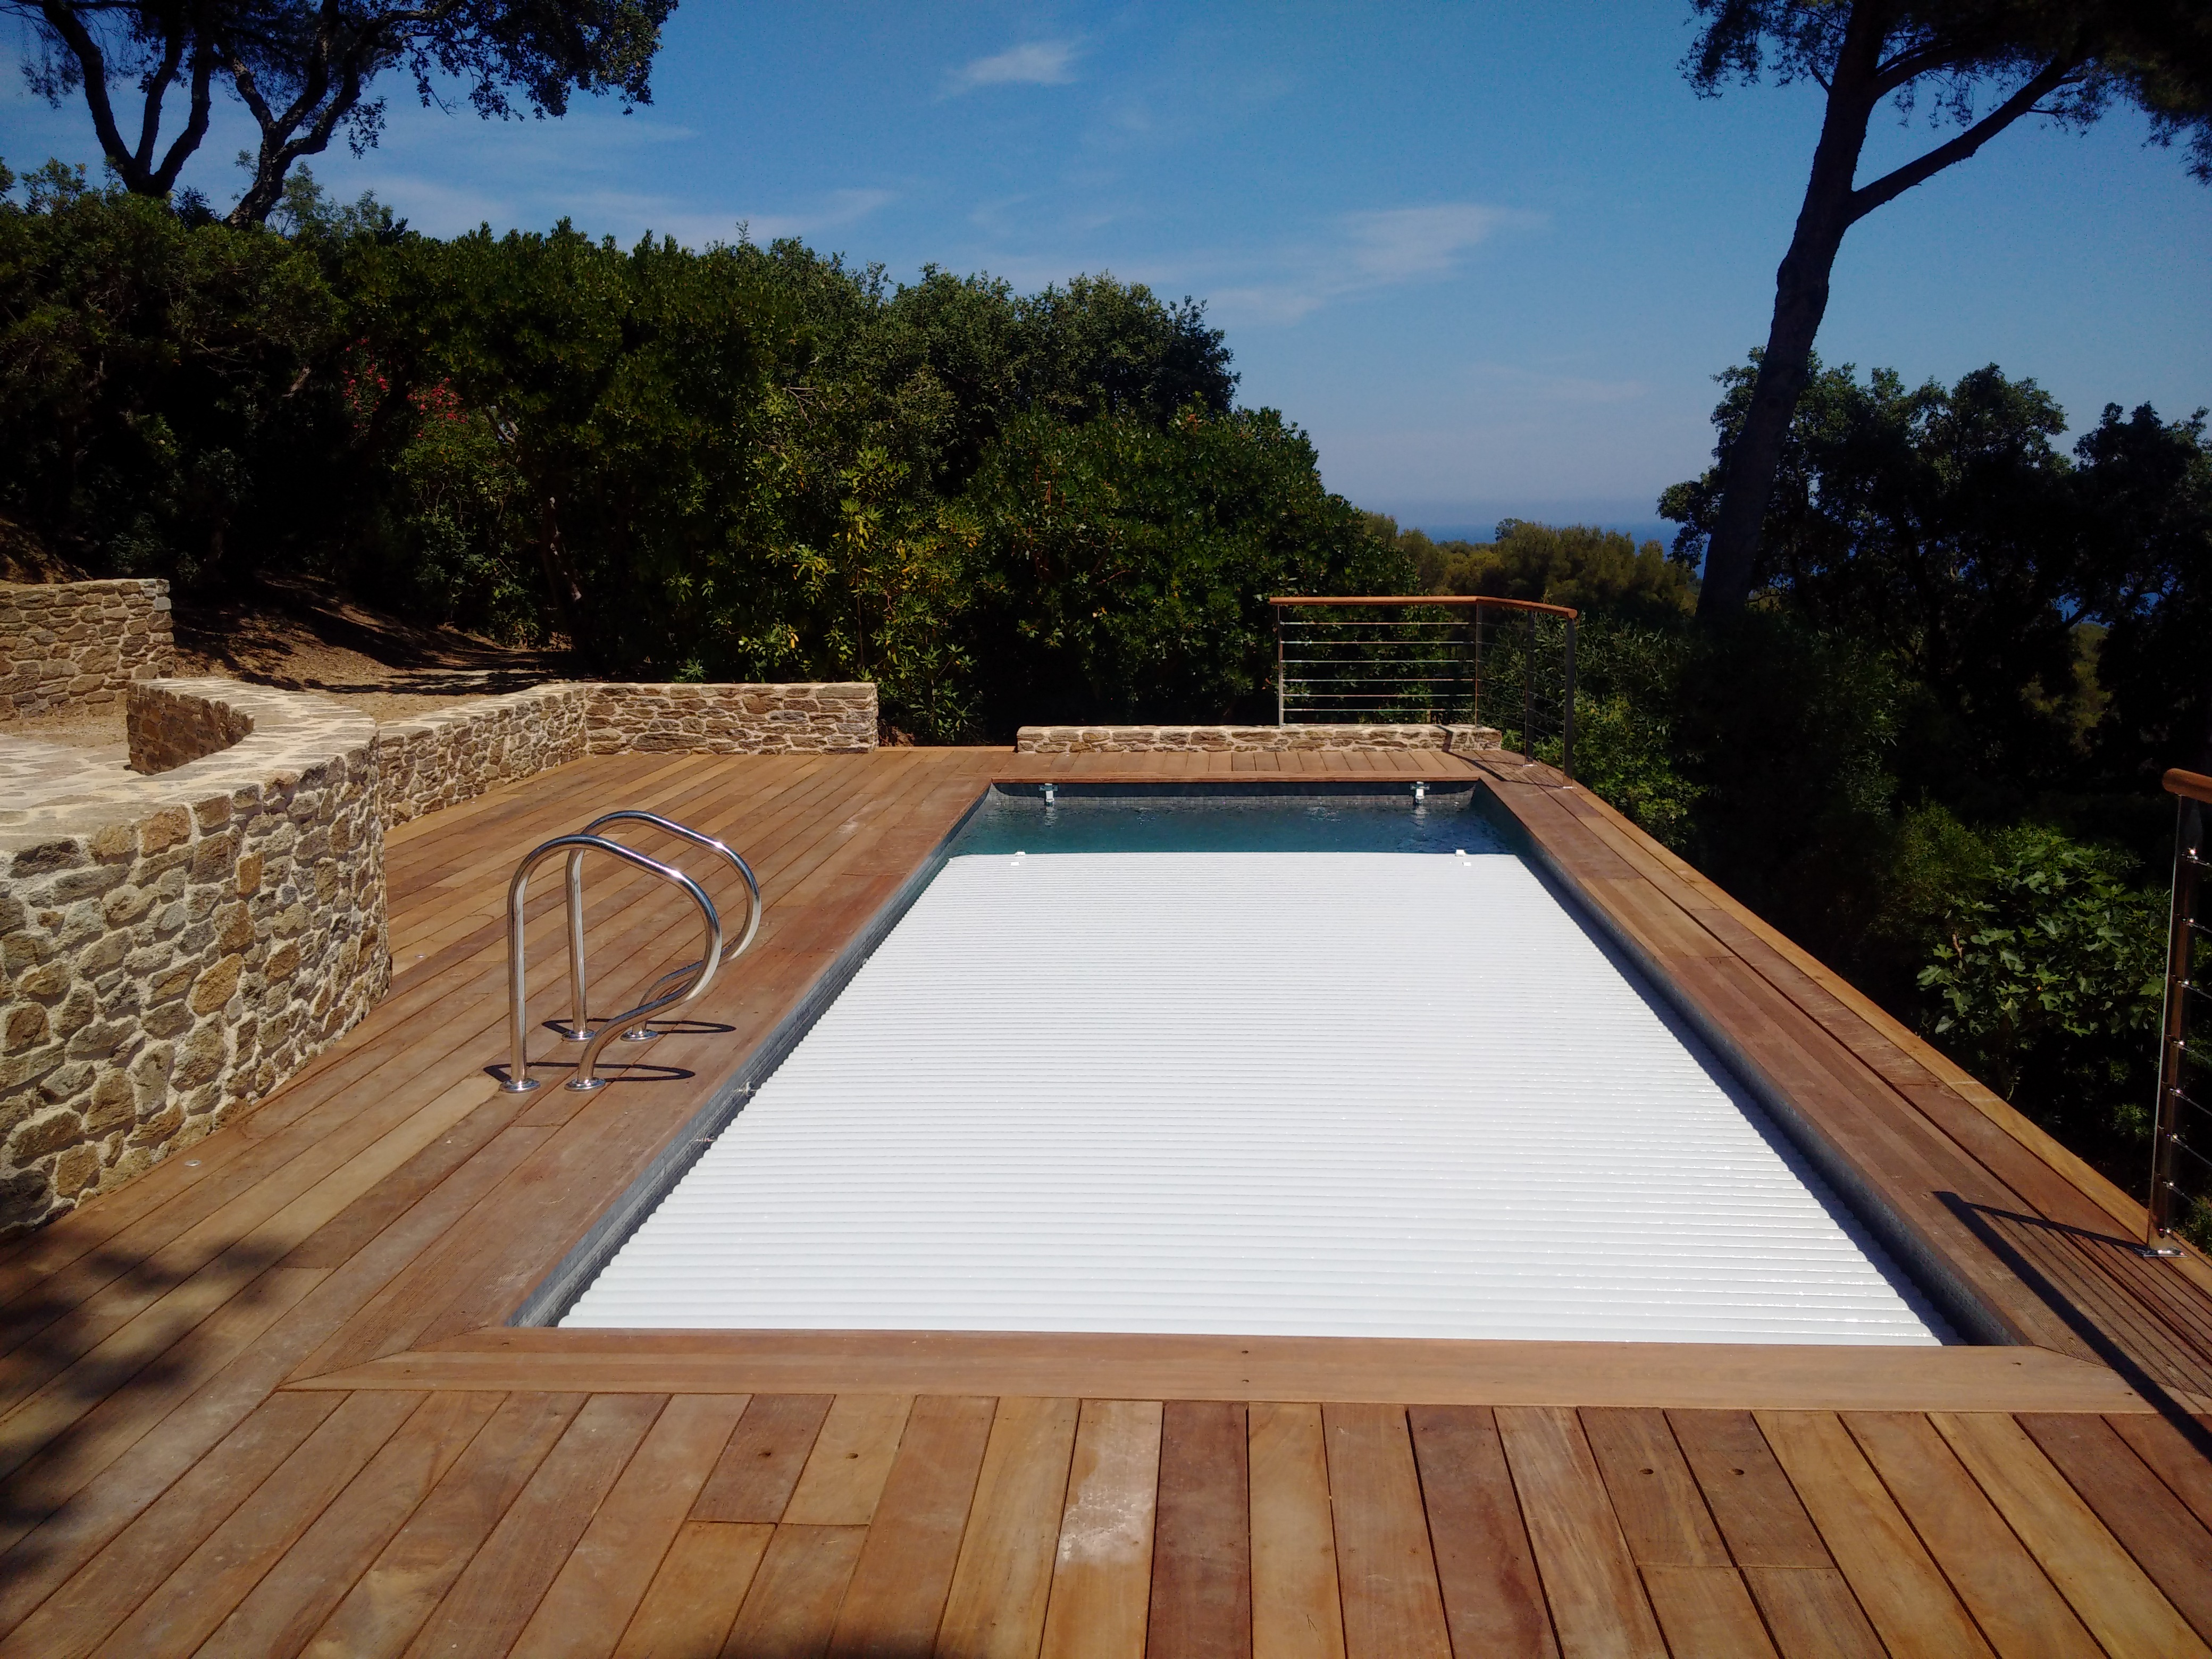 La piscine aquaset brignoles var draguignan fr jus for Piscine sans margelle